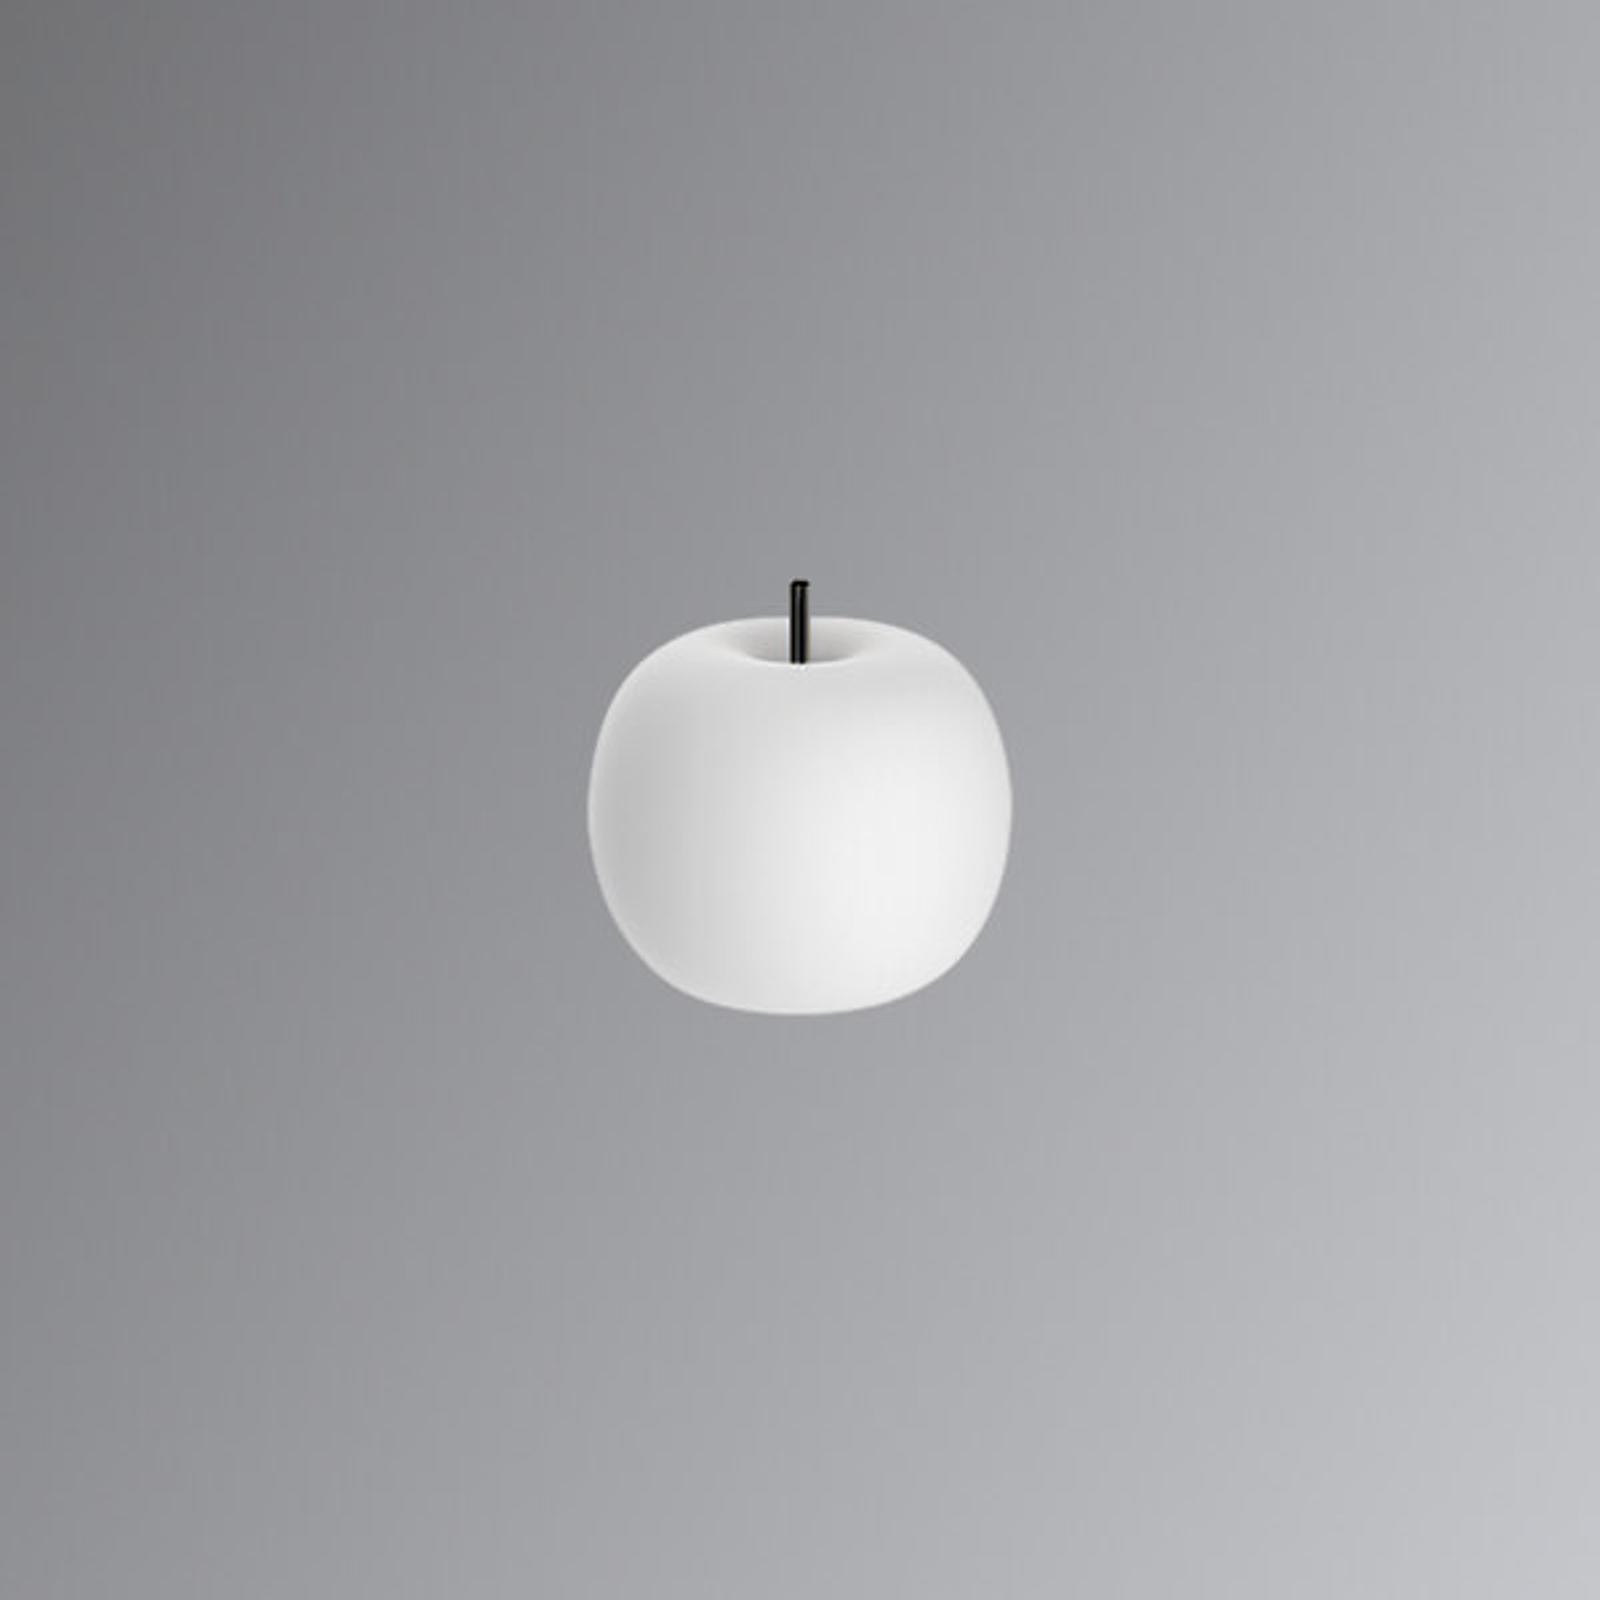 Kundalini Kushi - lampe à poser LED noir 16 cm